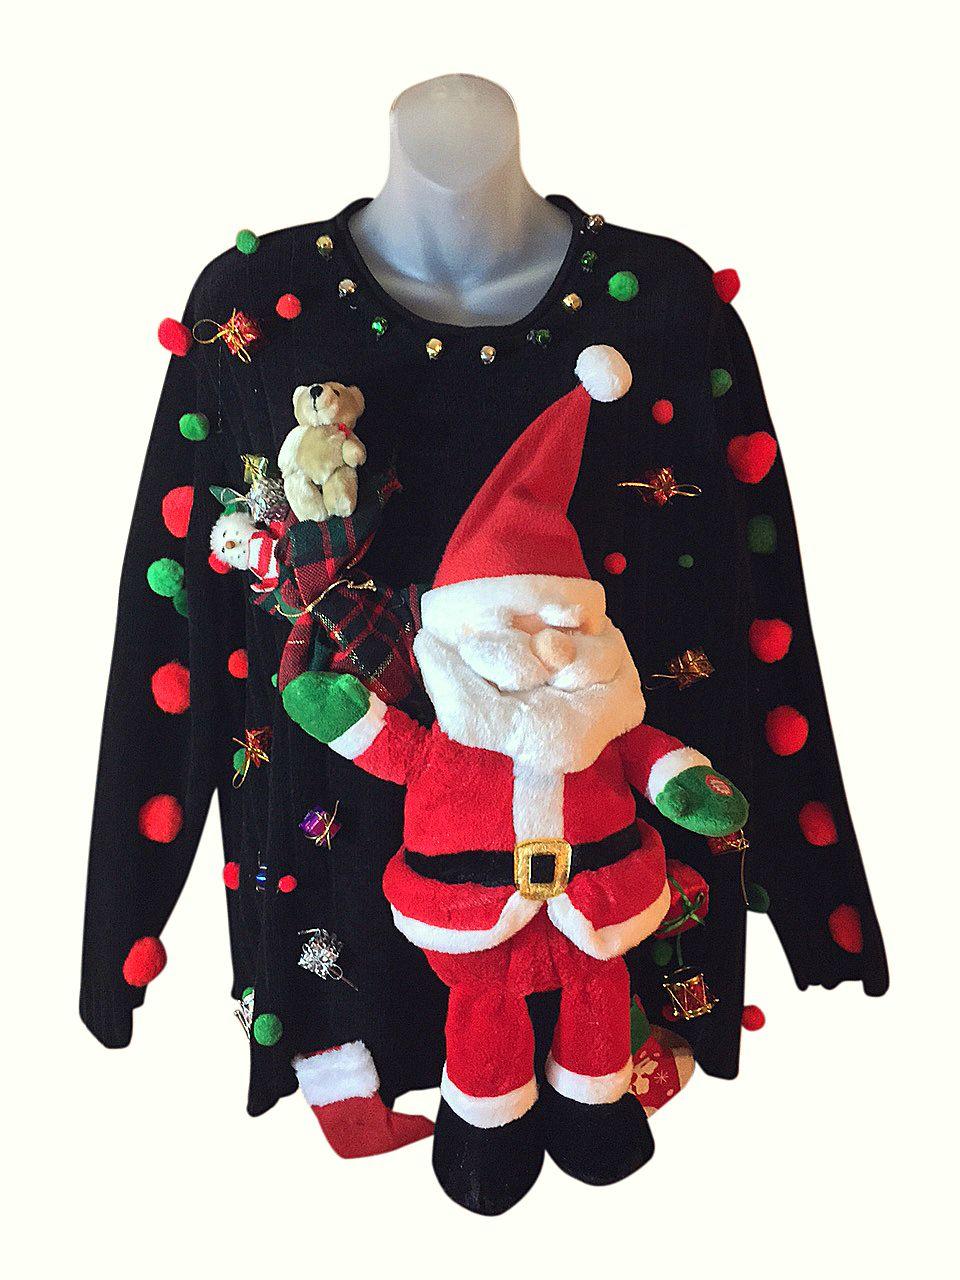 Custom Christmas Sweaters.Plush Singing Santa Custom Christmas Sweater 2x 52 26